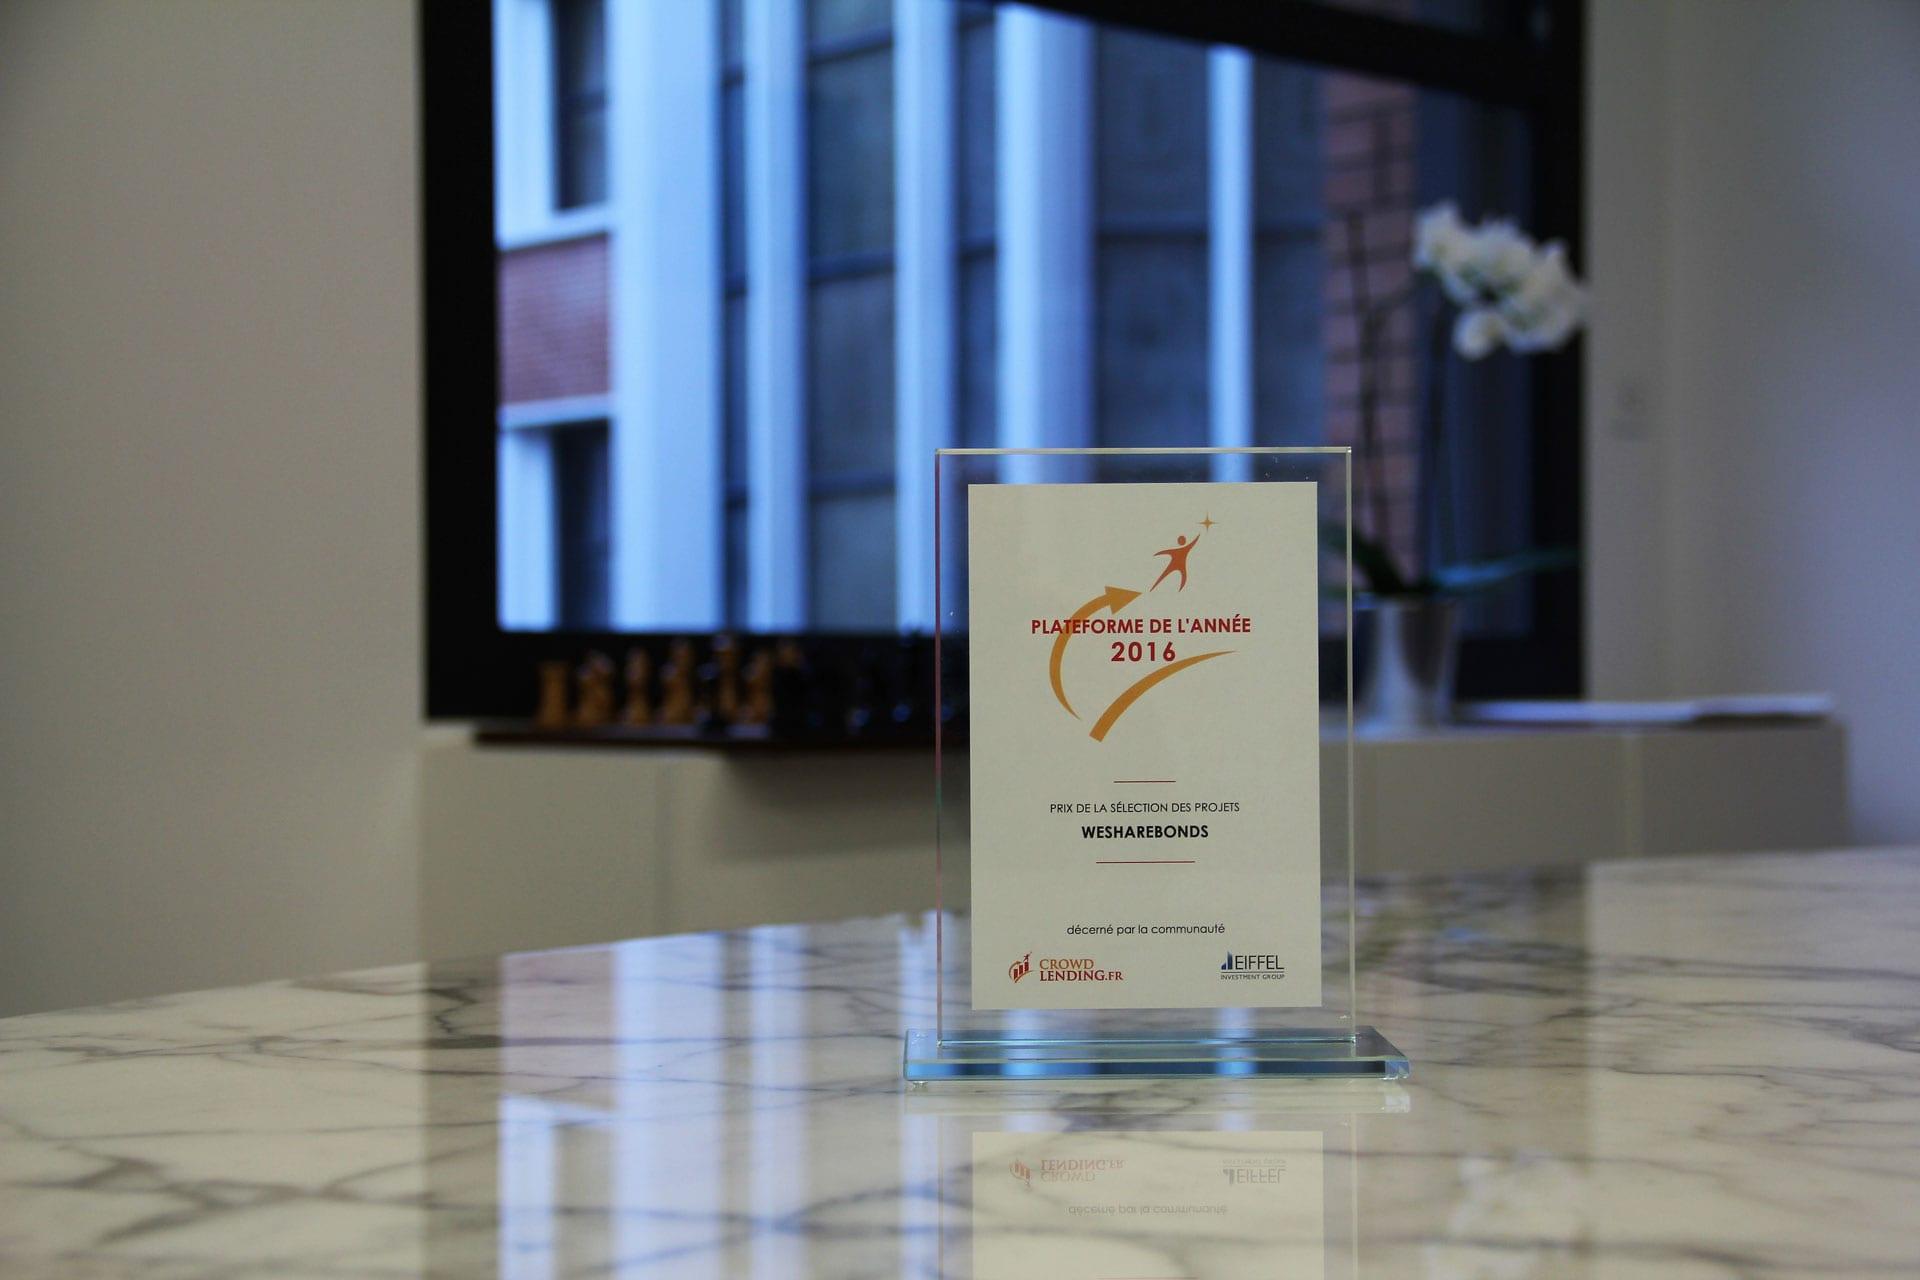 WeShareBonds prix plateforme année 2016